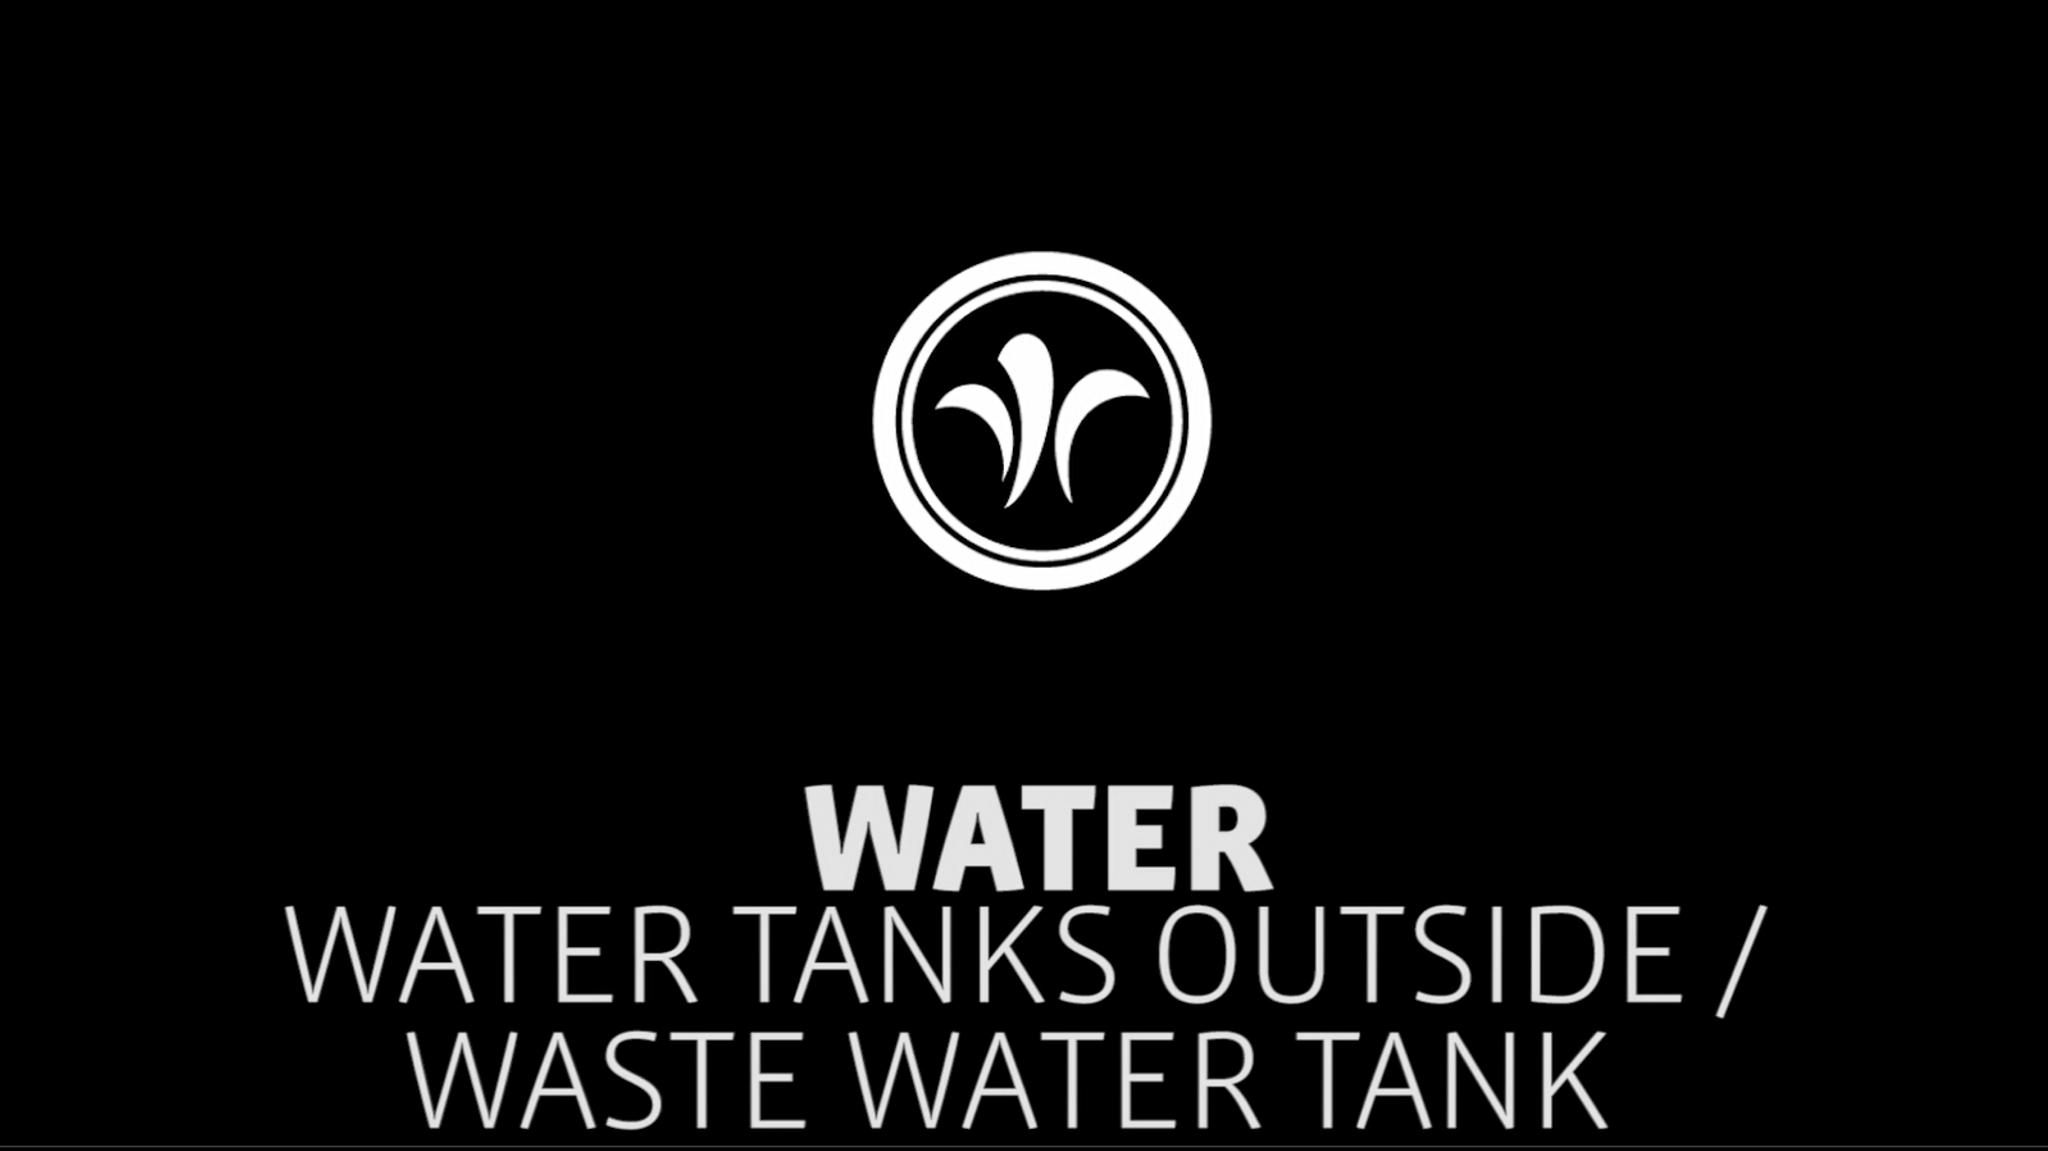 motorhome waste water tank // niesmann+bischoff - camper (model ARTO) // 2019 // WA5